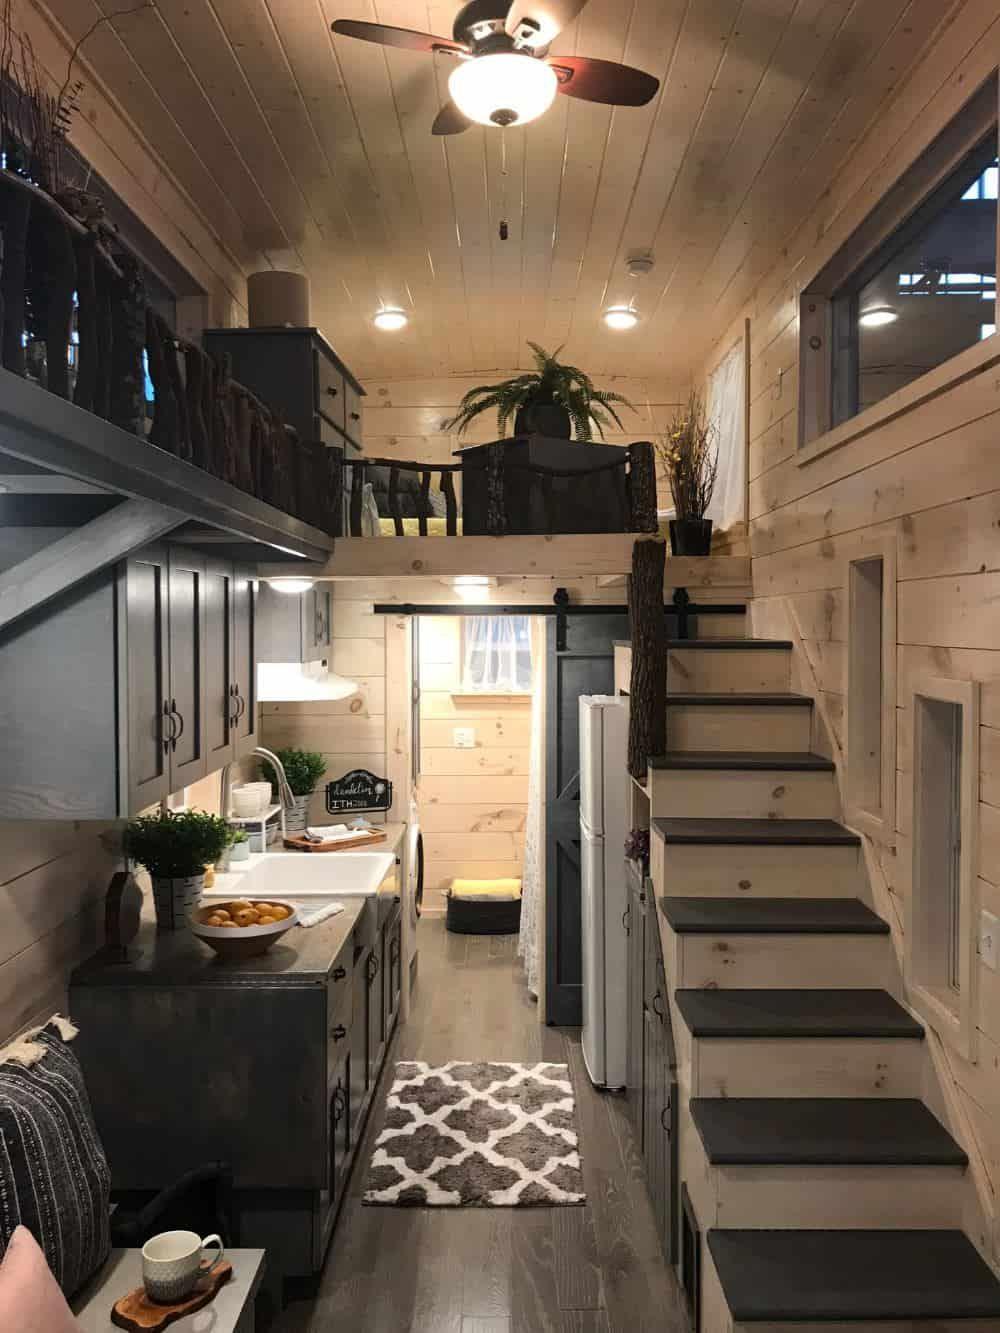 27 Clever Tiny House Kitchen Ideas (Photos)